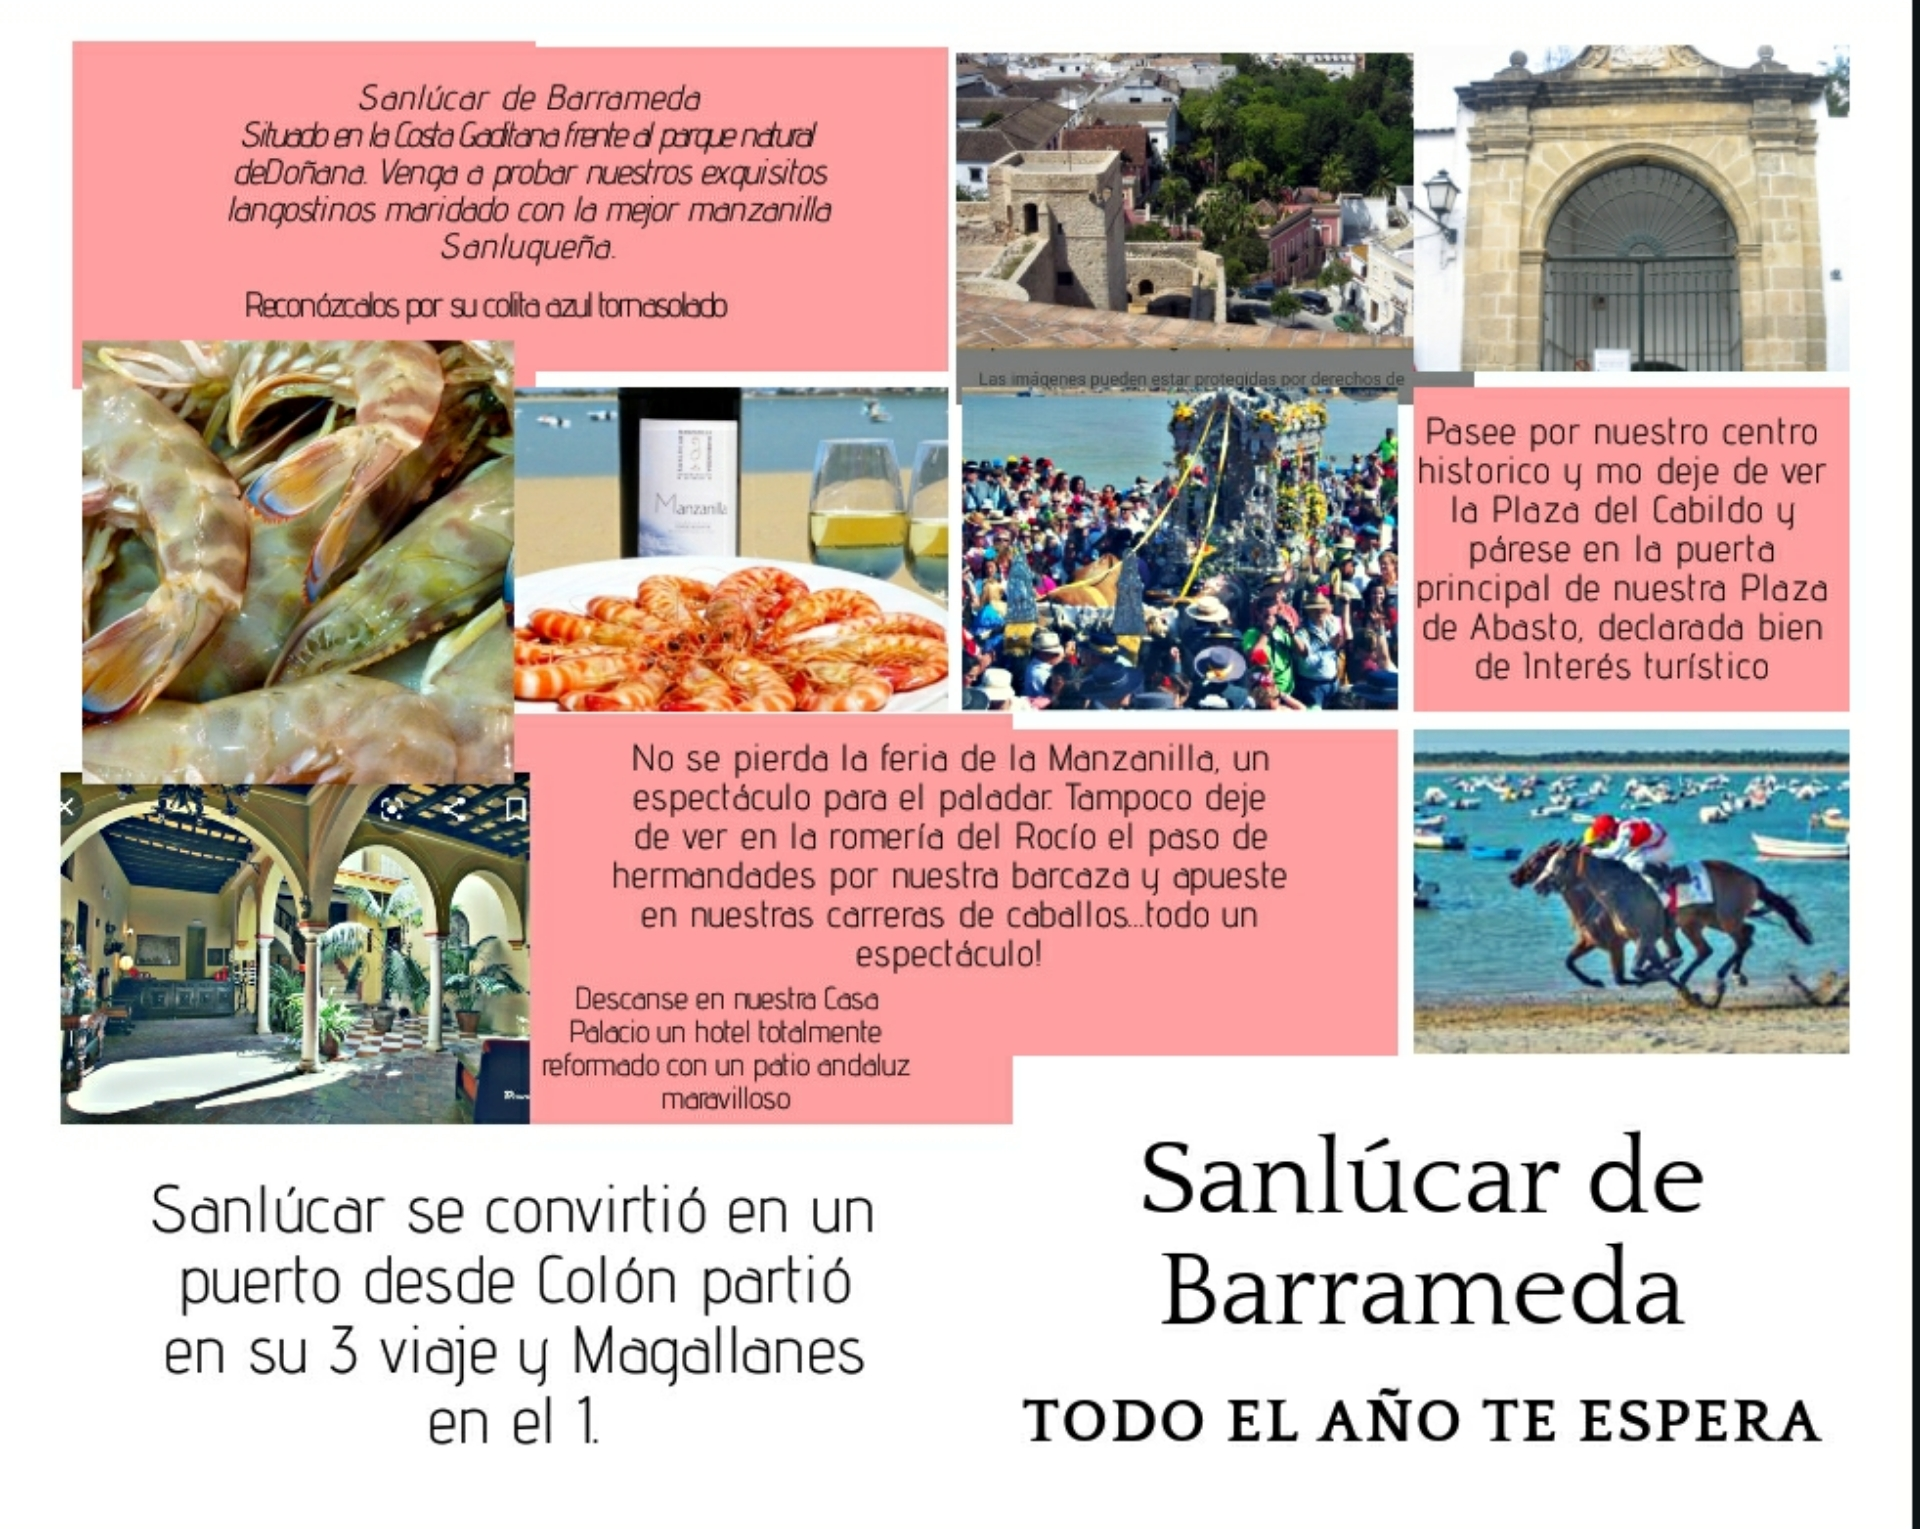 Folleto turístico - Sanlúcar de Barrameda (Joaquín Contreras - 3º ESO)